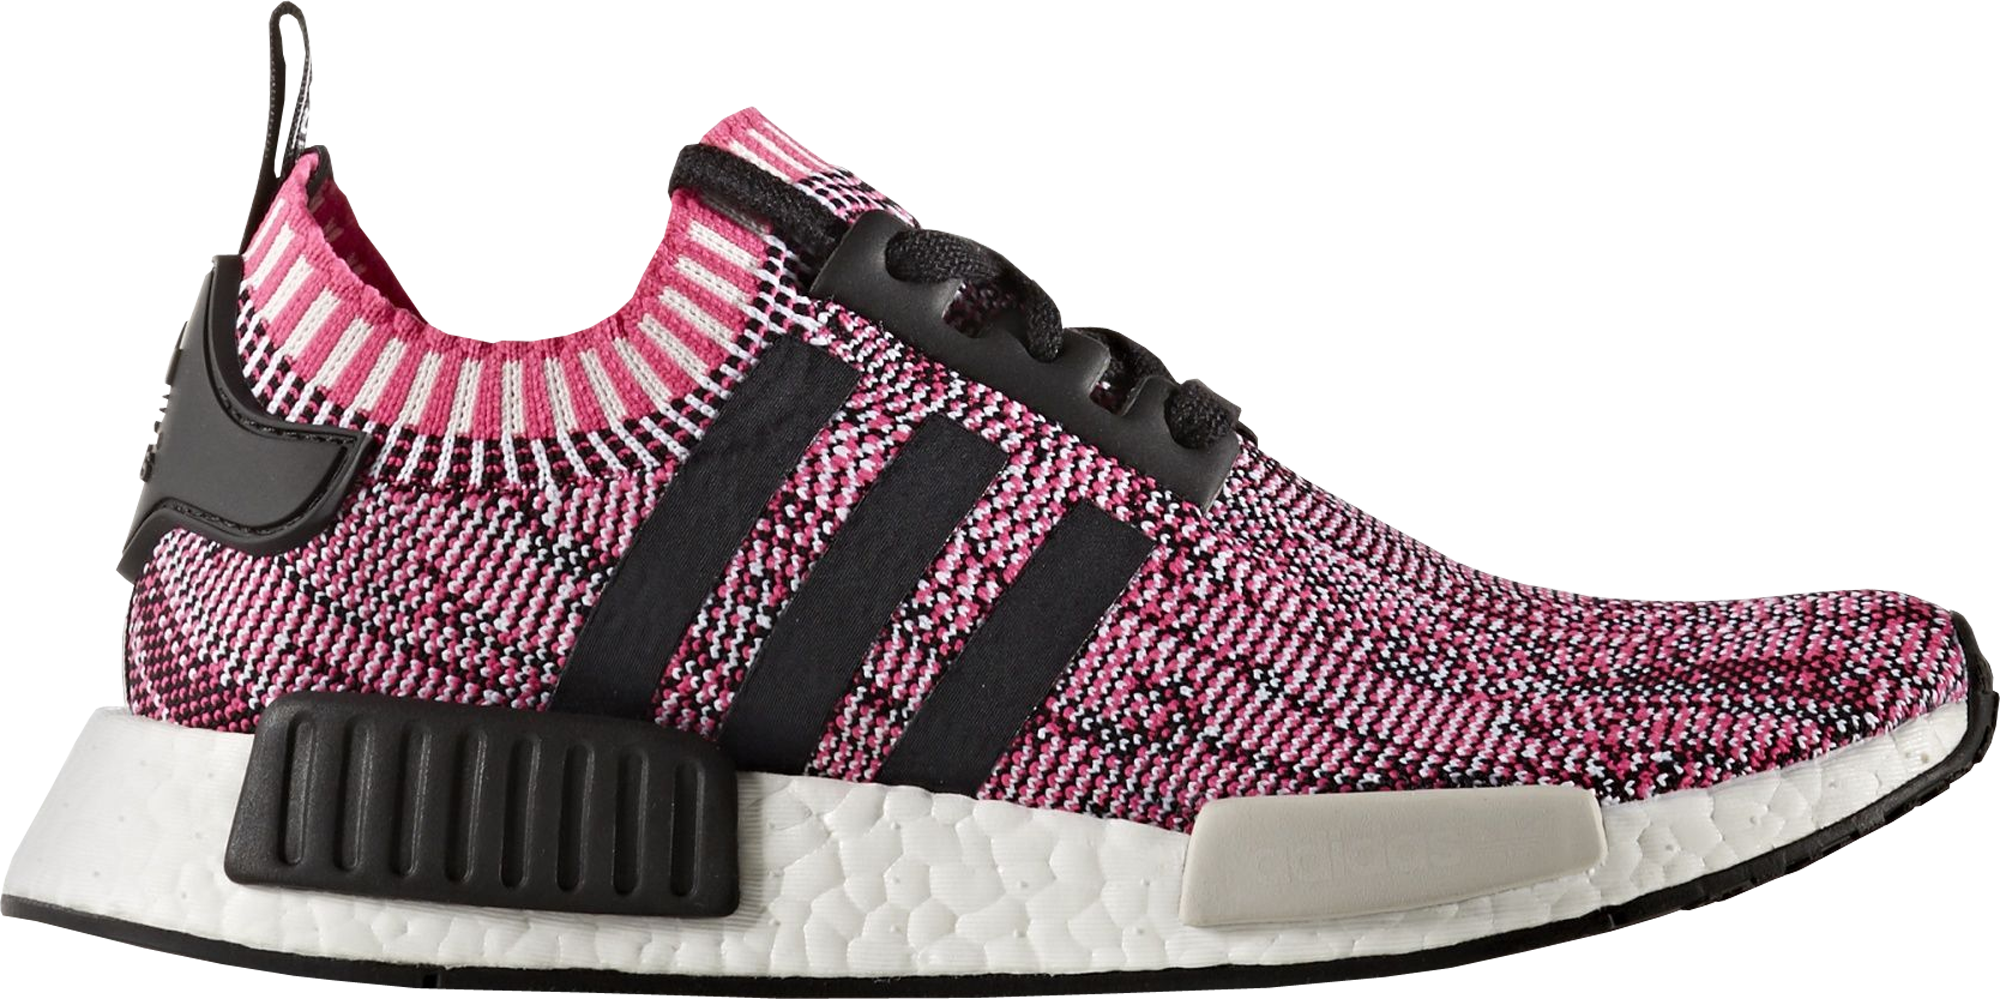 adidas nmd r1 pink primeknit